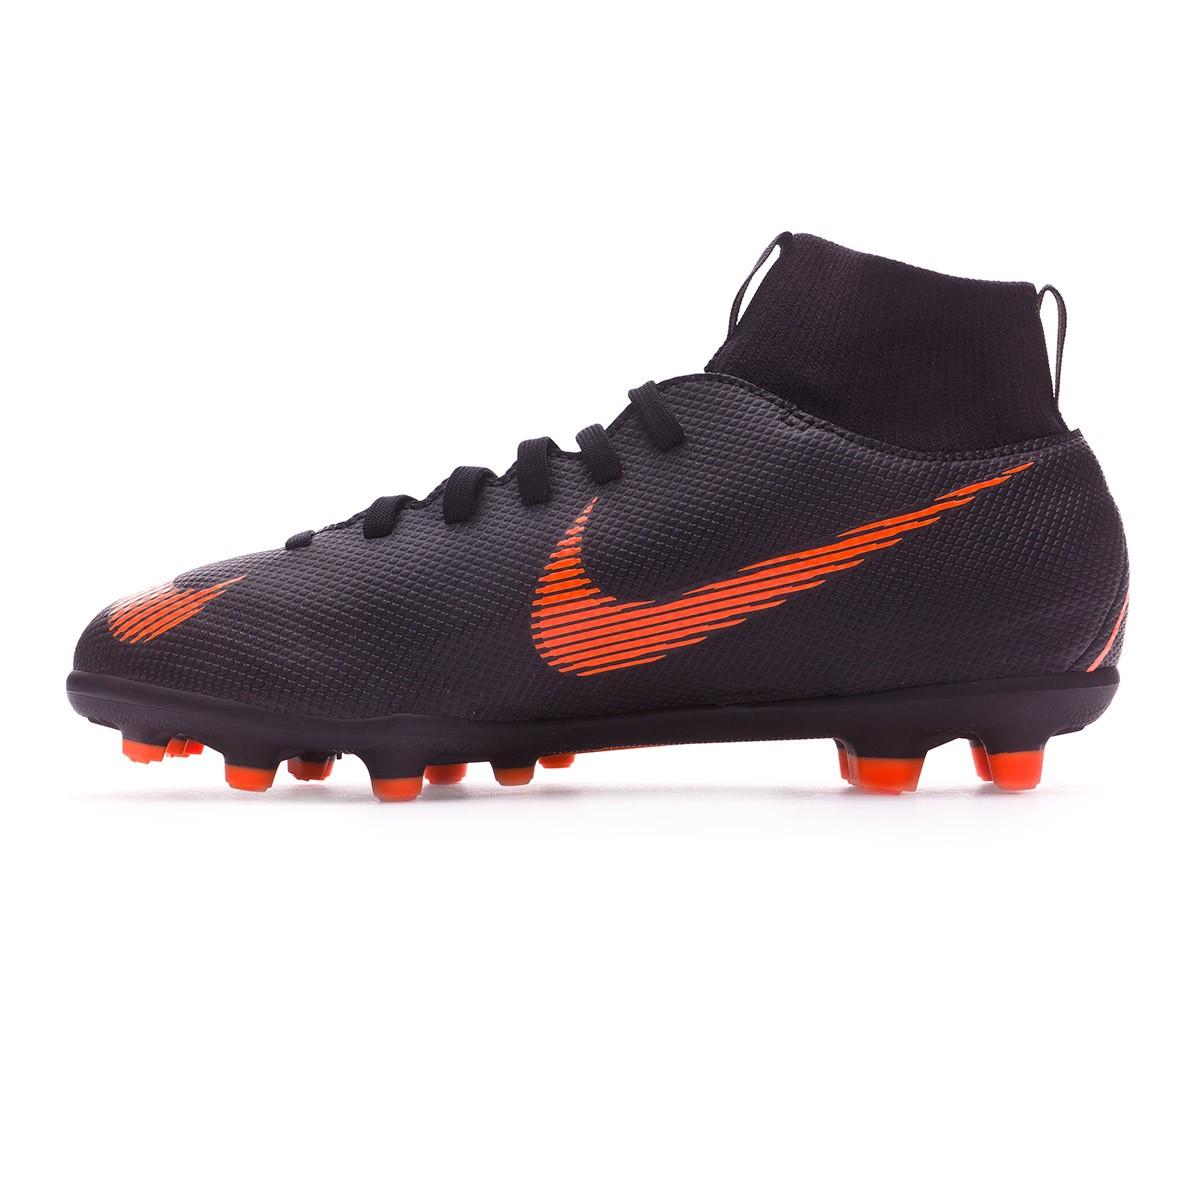 90299b59f691d Football Boots Nike Kids Mercurial Superfly VI Club MG Black-Total  orange-White - Tienda de fútbol Fútbol Emotion